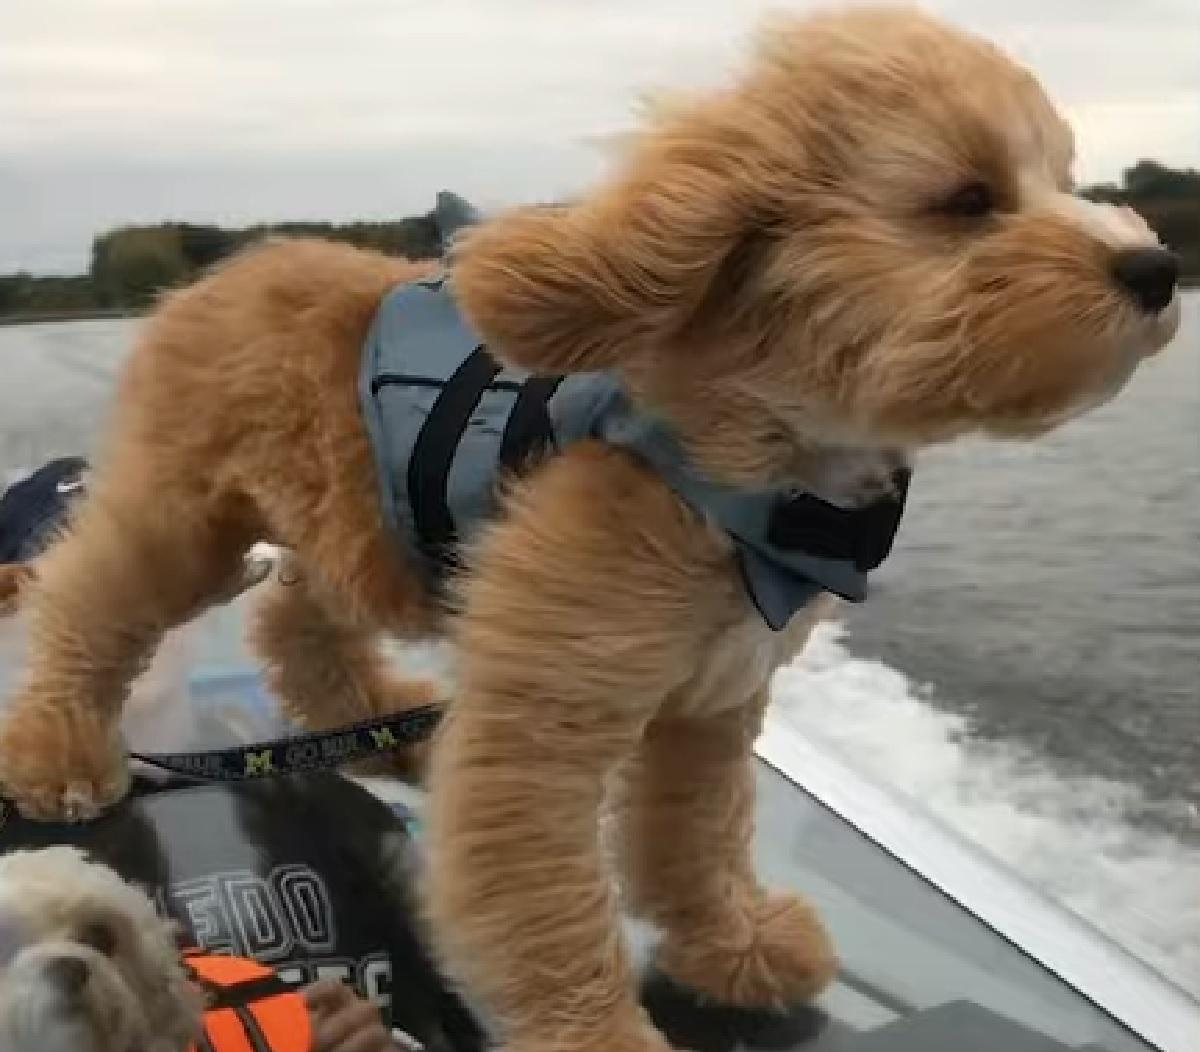 paddington cucciolo barboncino grand rapids